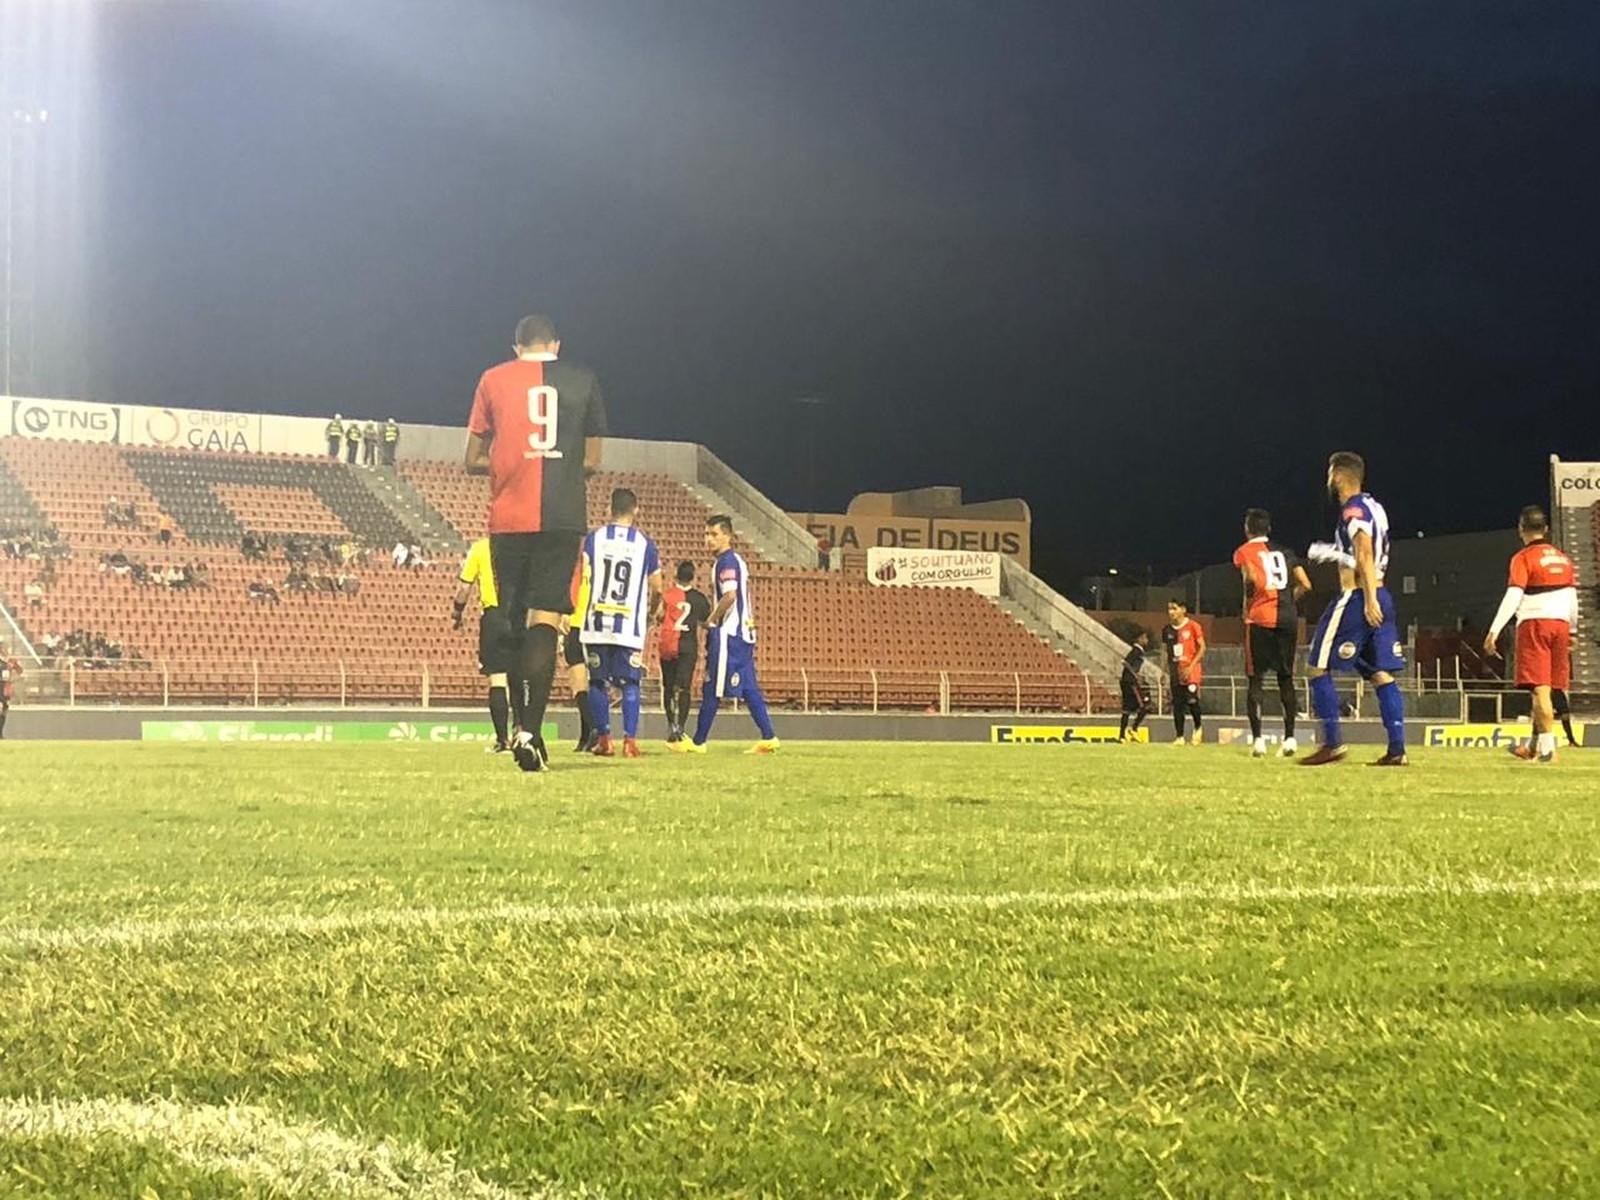 Sinop-MT vence o Capital-TO na despedida da Copa São Paulo 2019